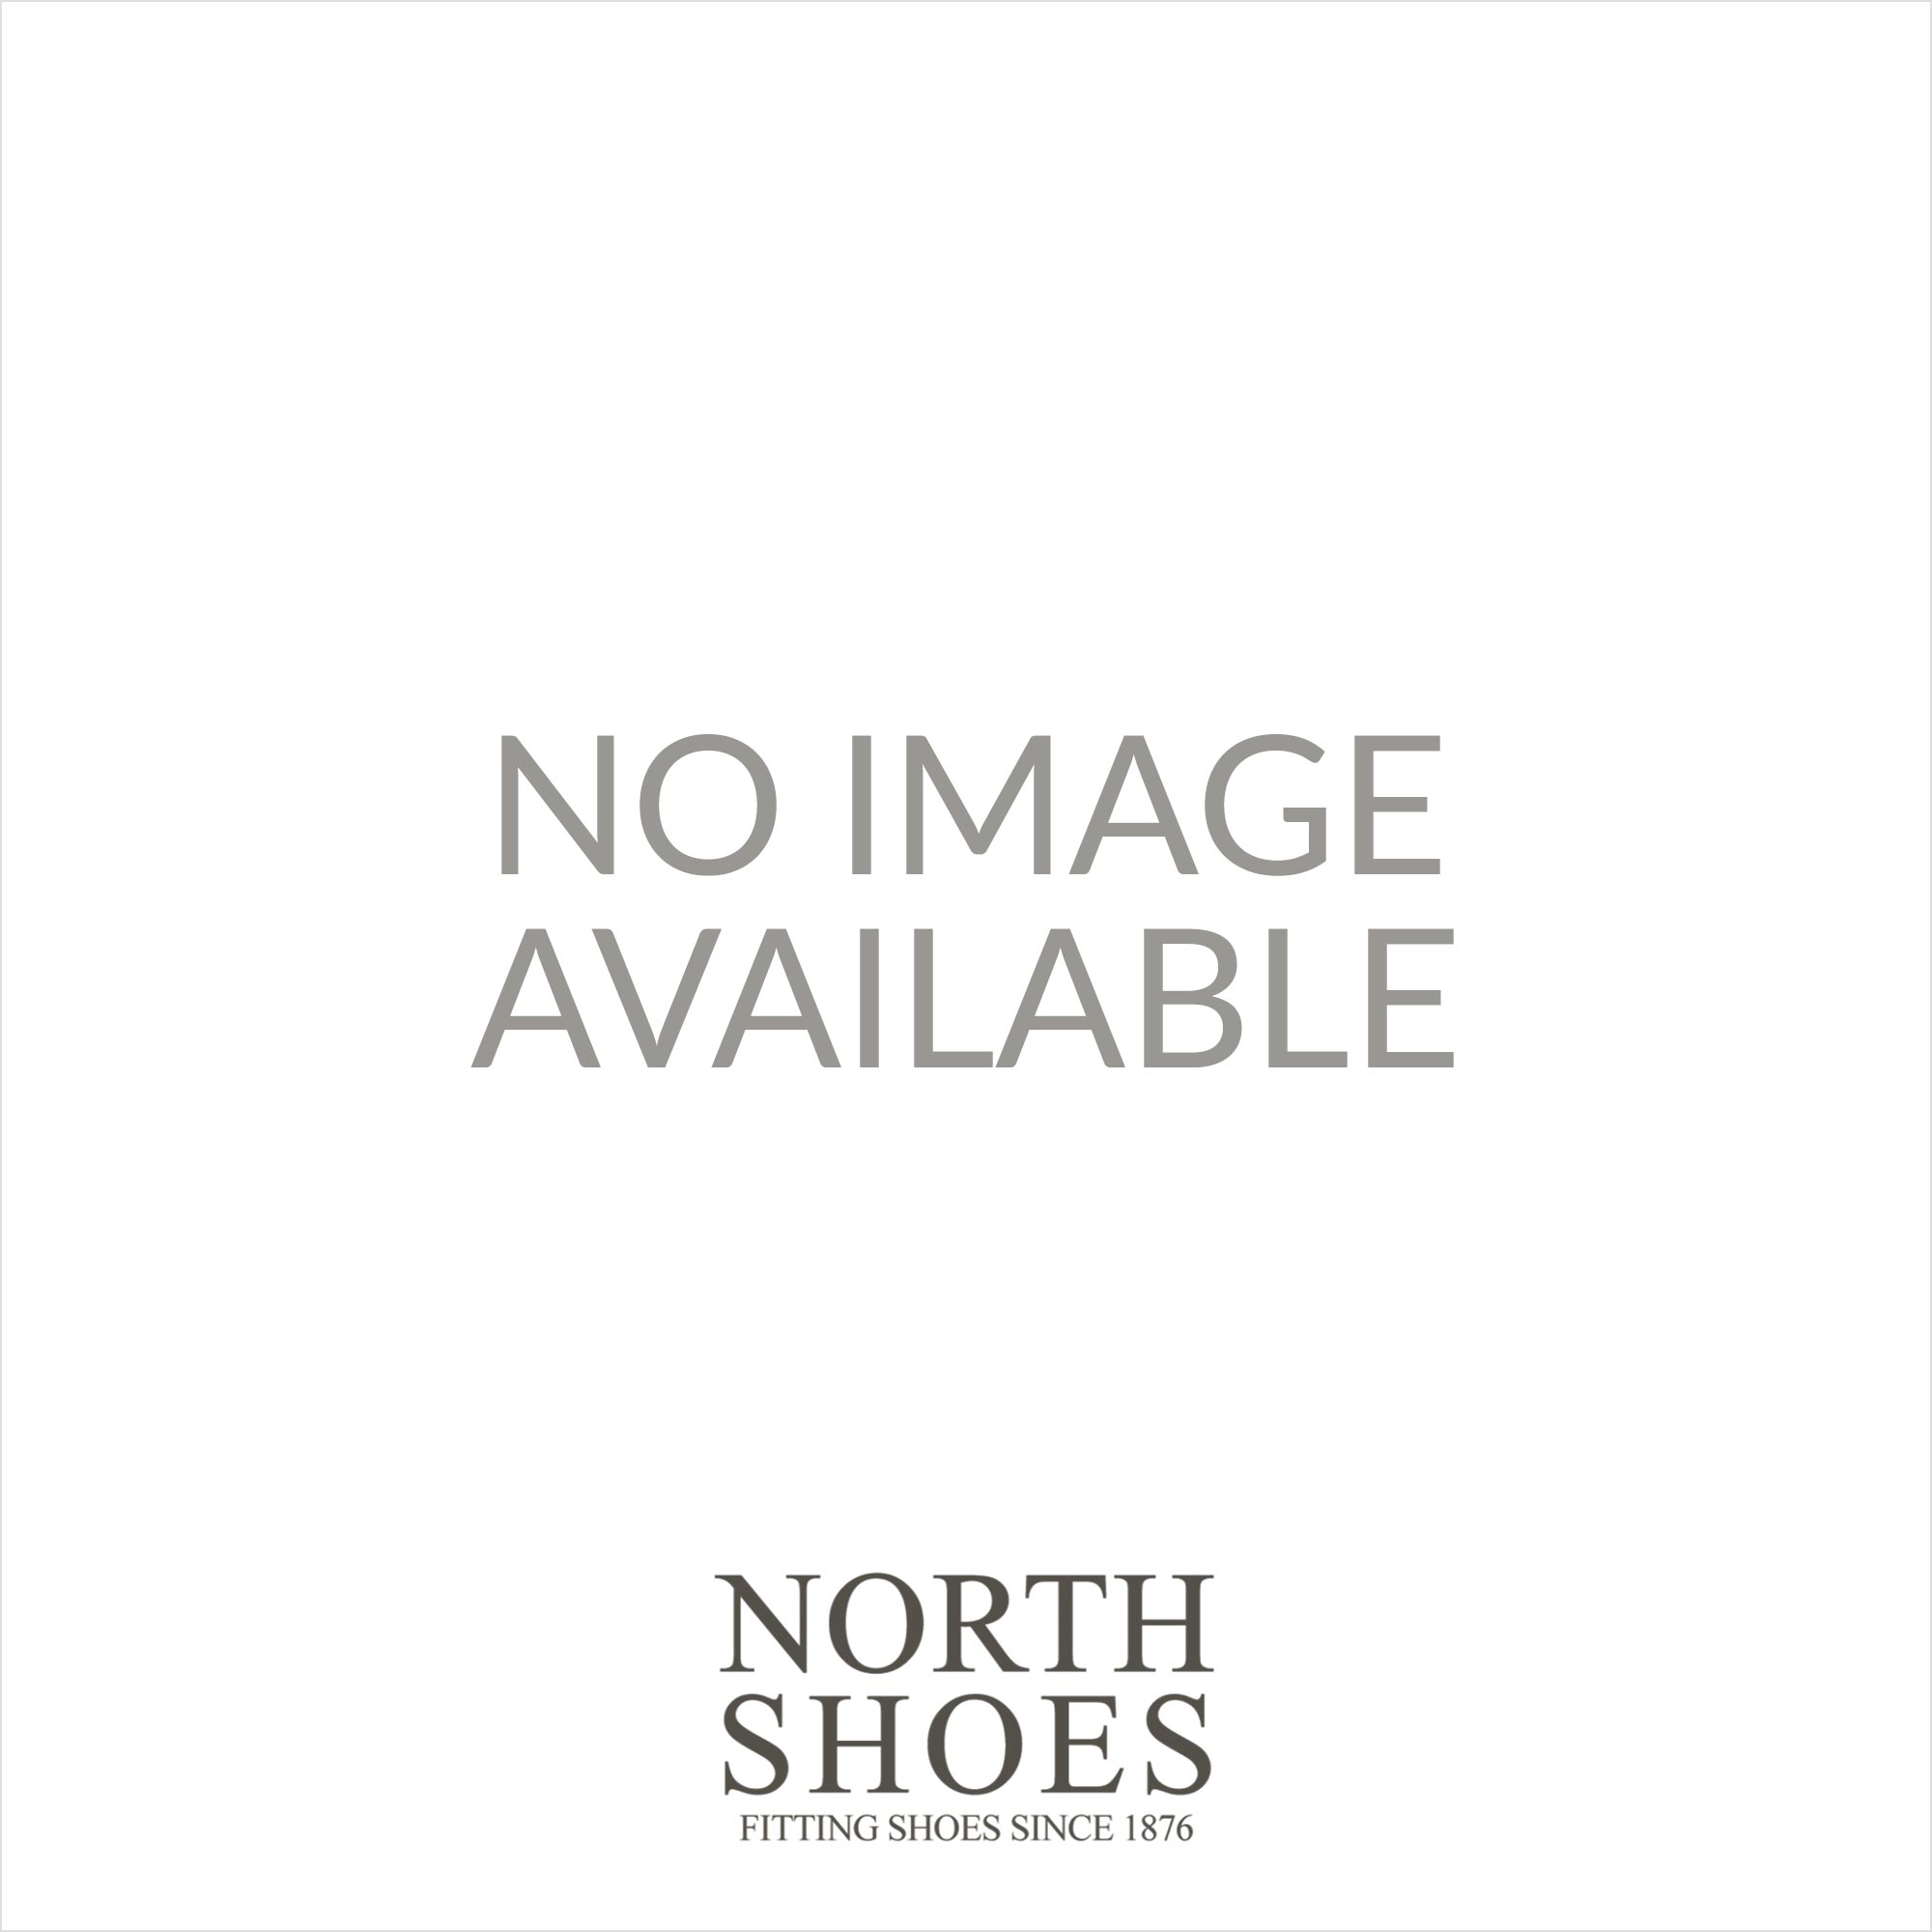 0156bbb87 ... Clarks Festival Glory Aqua Patent Leather Womens Mary Jane Shoe ...